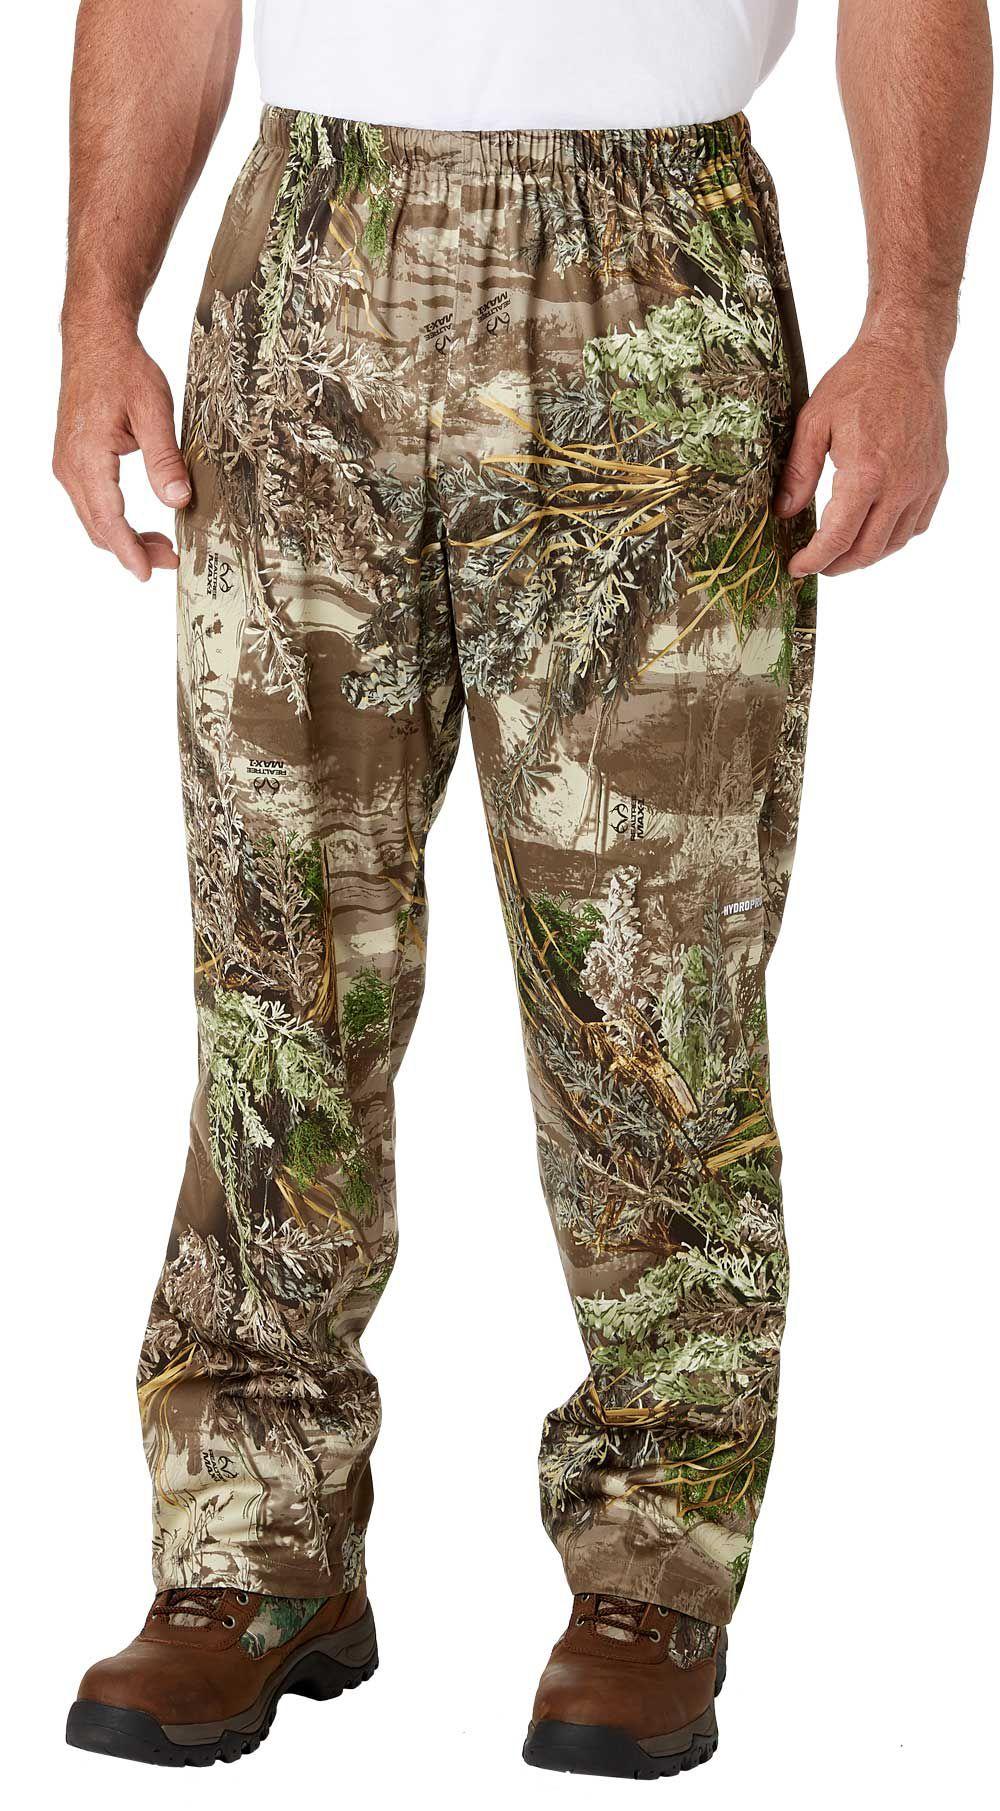 Field & Stream Lightweight Packable Rain Hunting Pants, Men's, Size: 4XL, Green thumbnail